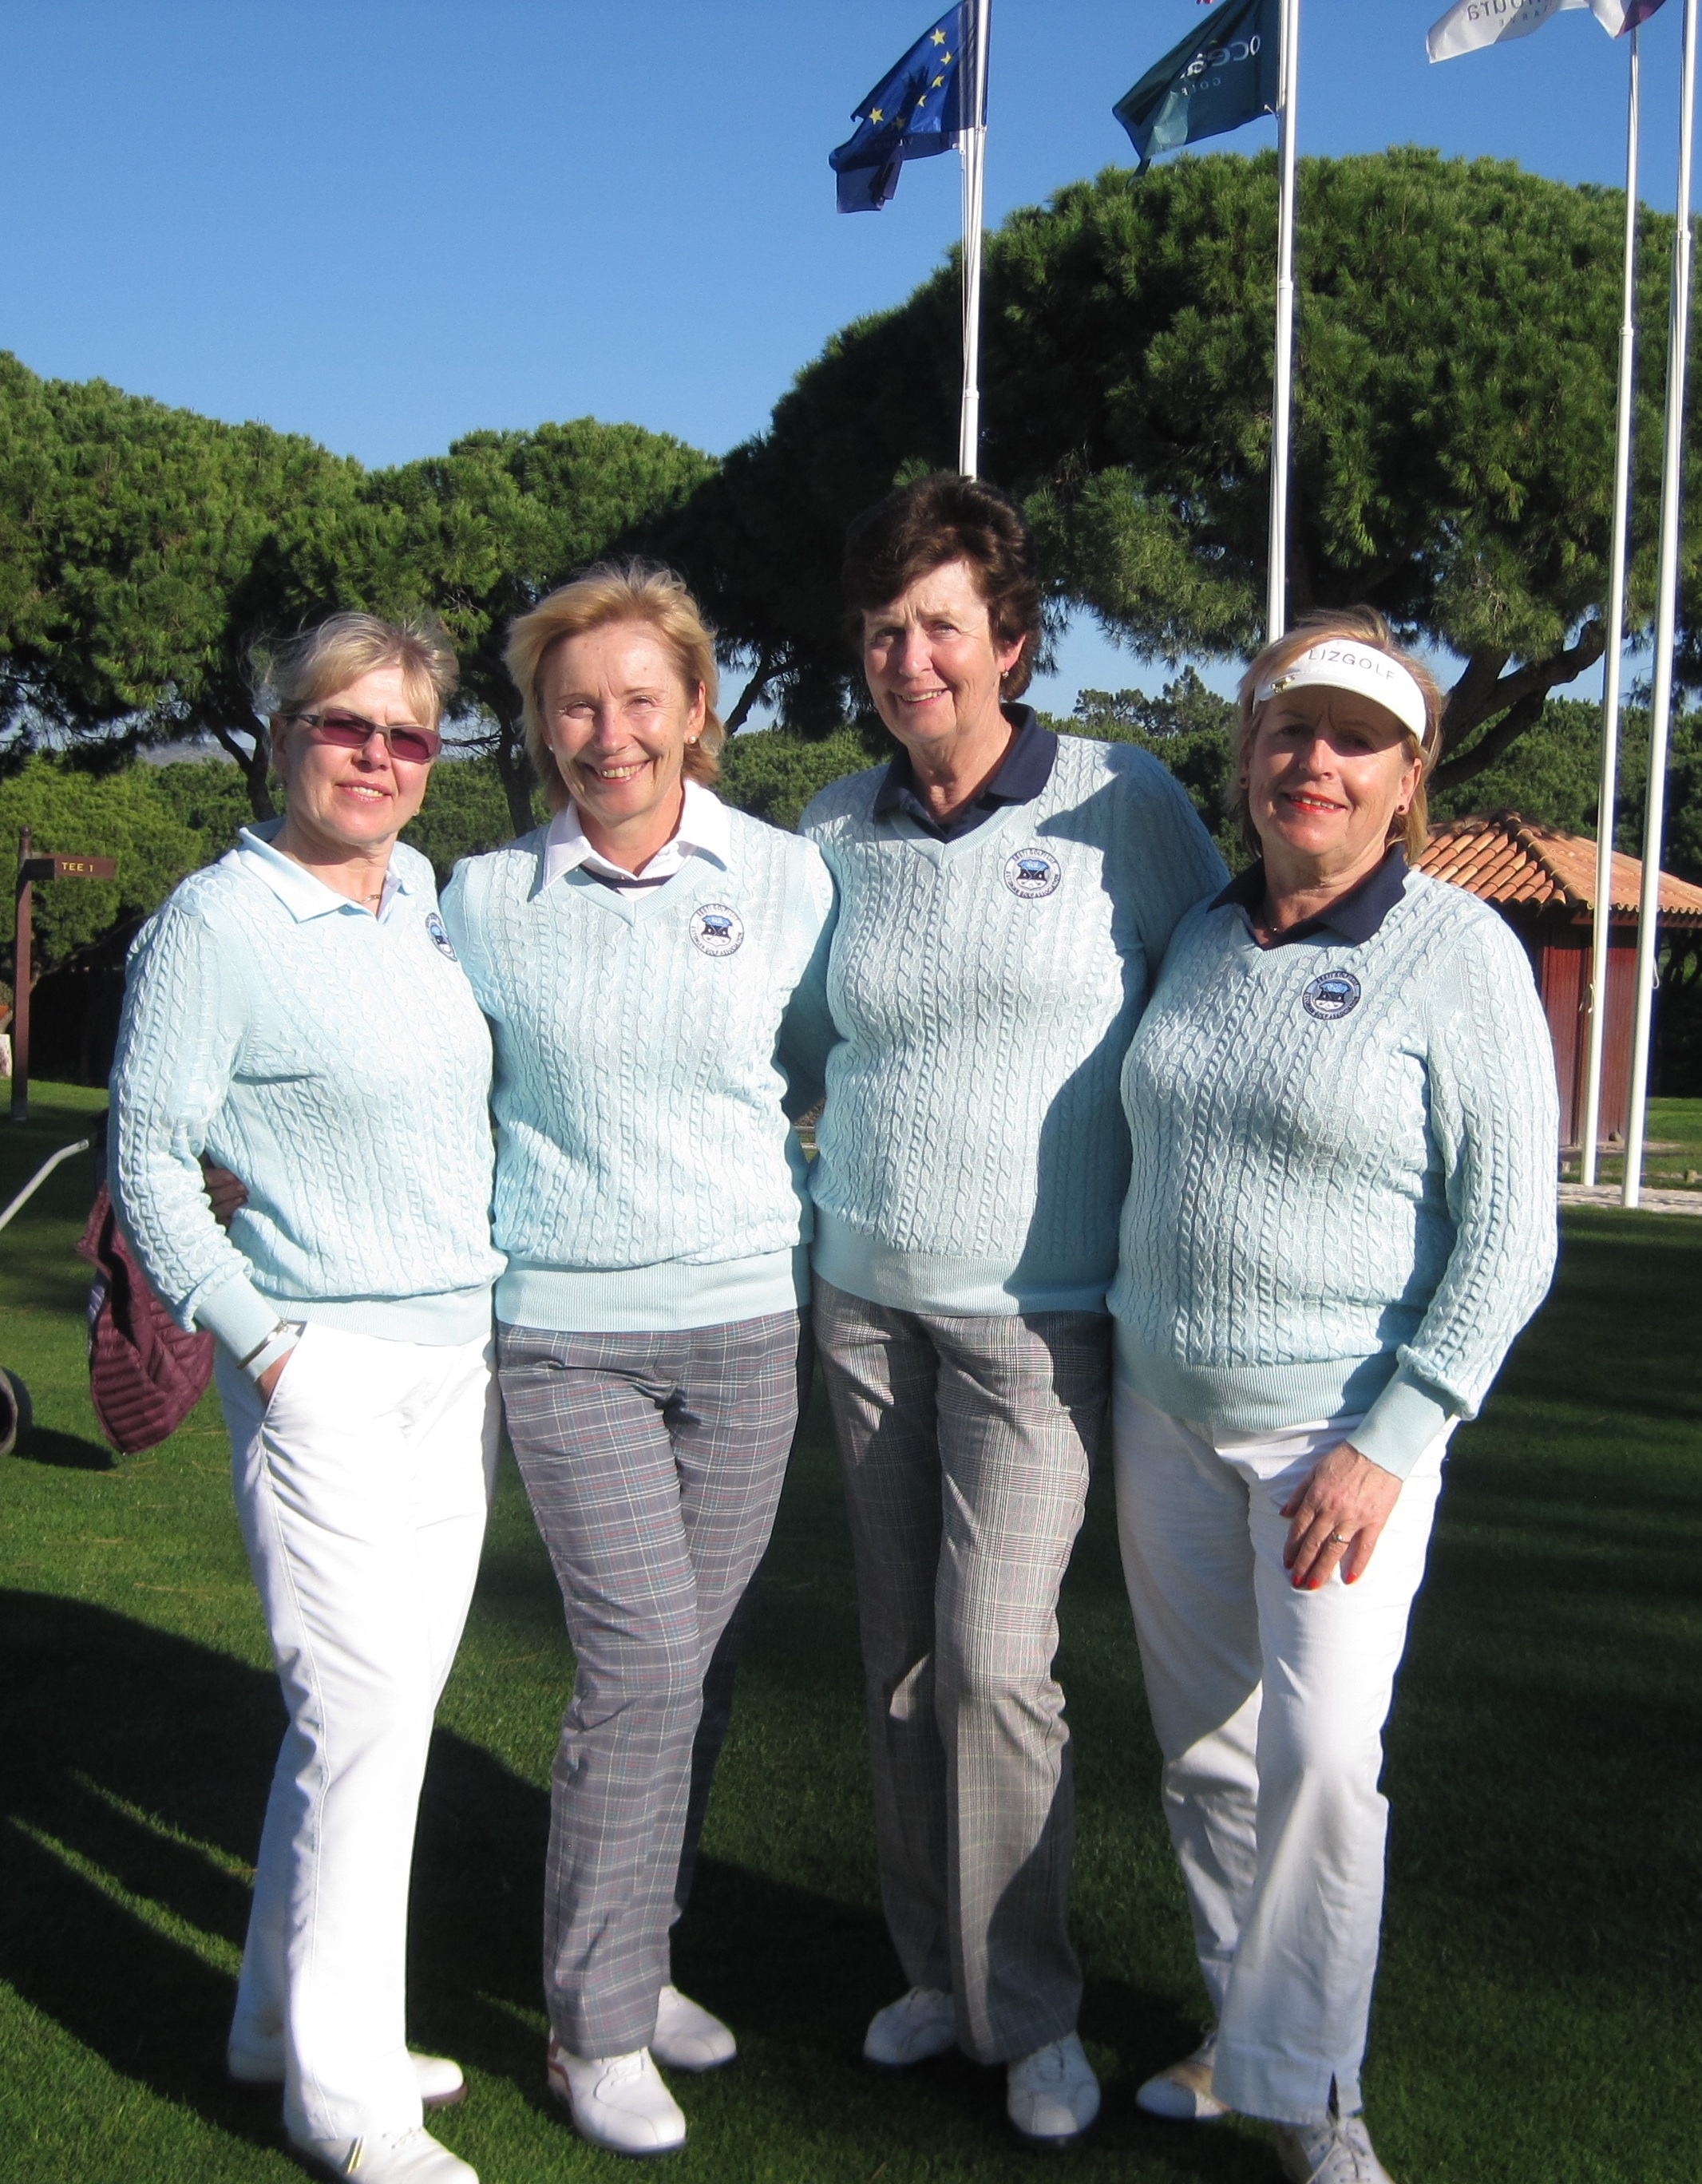 seniorite naised Portugalis 2013